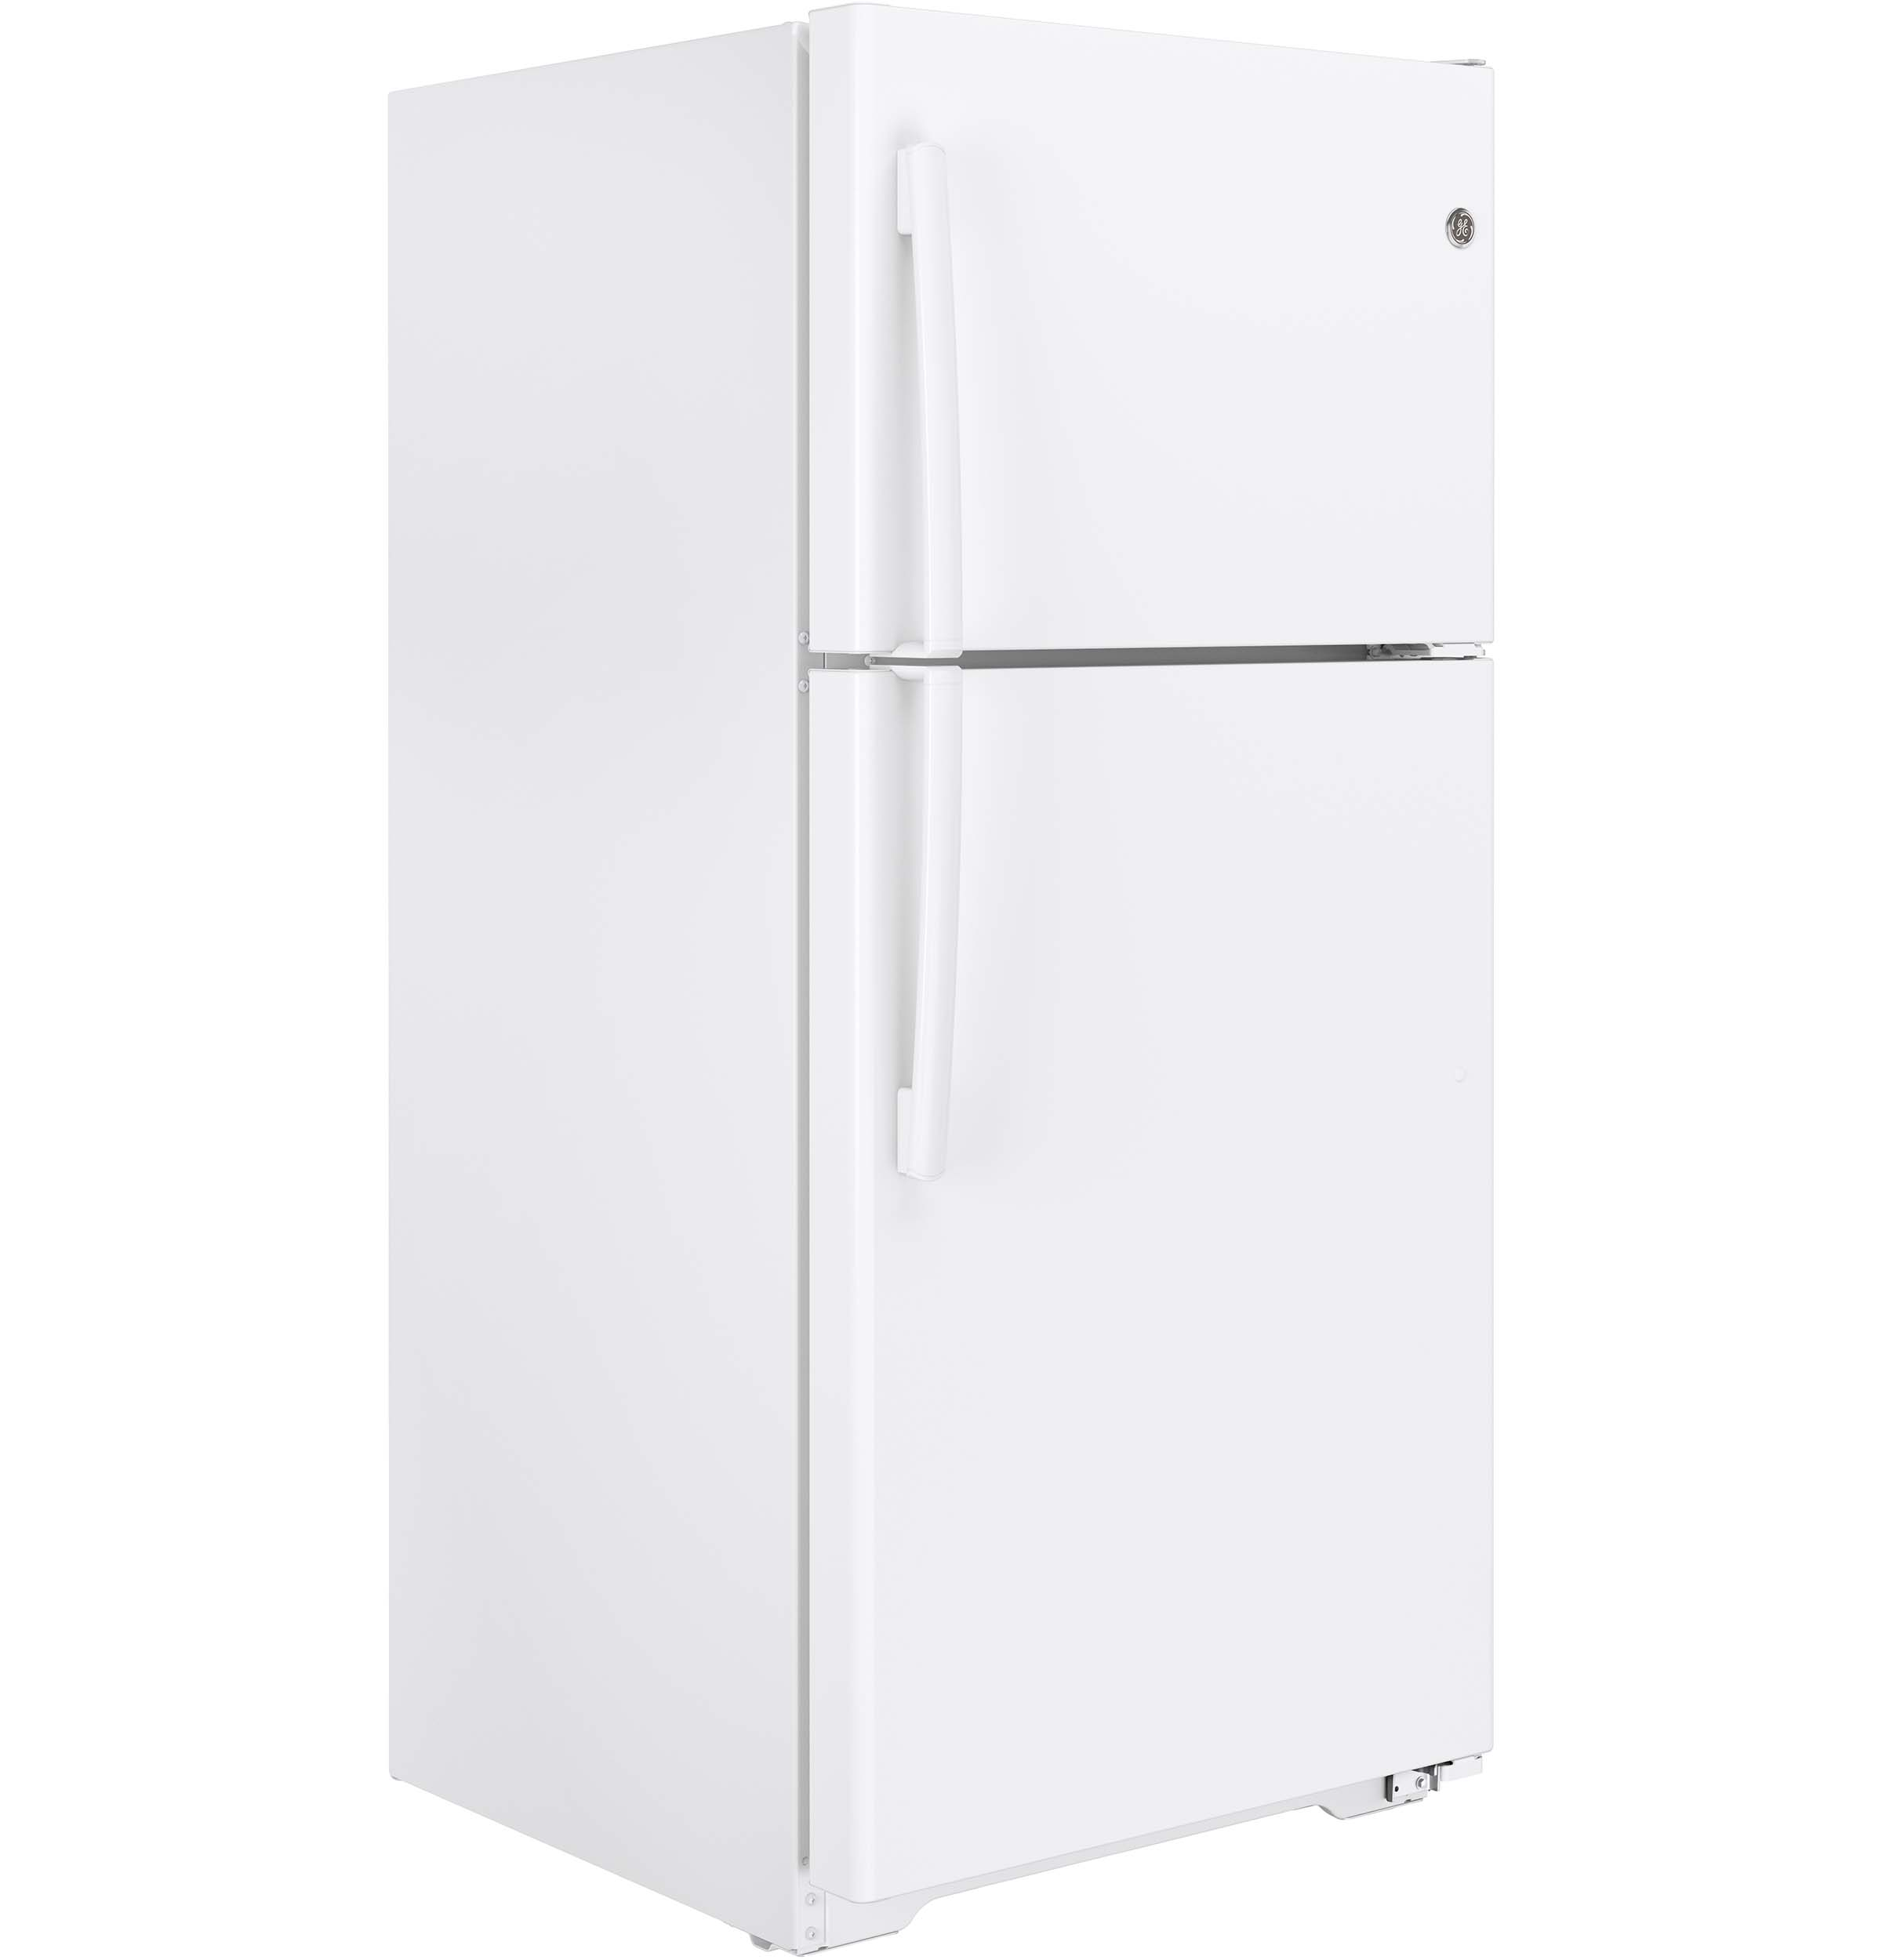 Model: GIE18ETHWW | GE GE® ENERGY STAR® 18.2 Cu. Ft. Top-Freezer Refrigerator